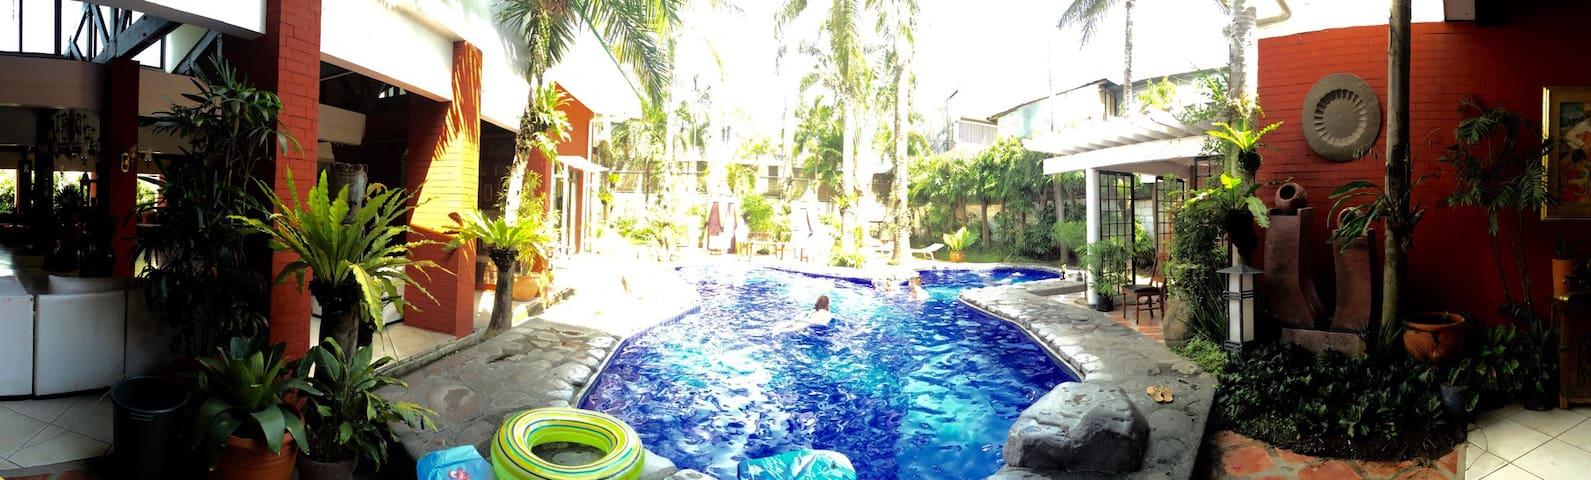 The Brick House Resort & Events - Calamba City - Hus